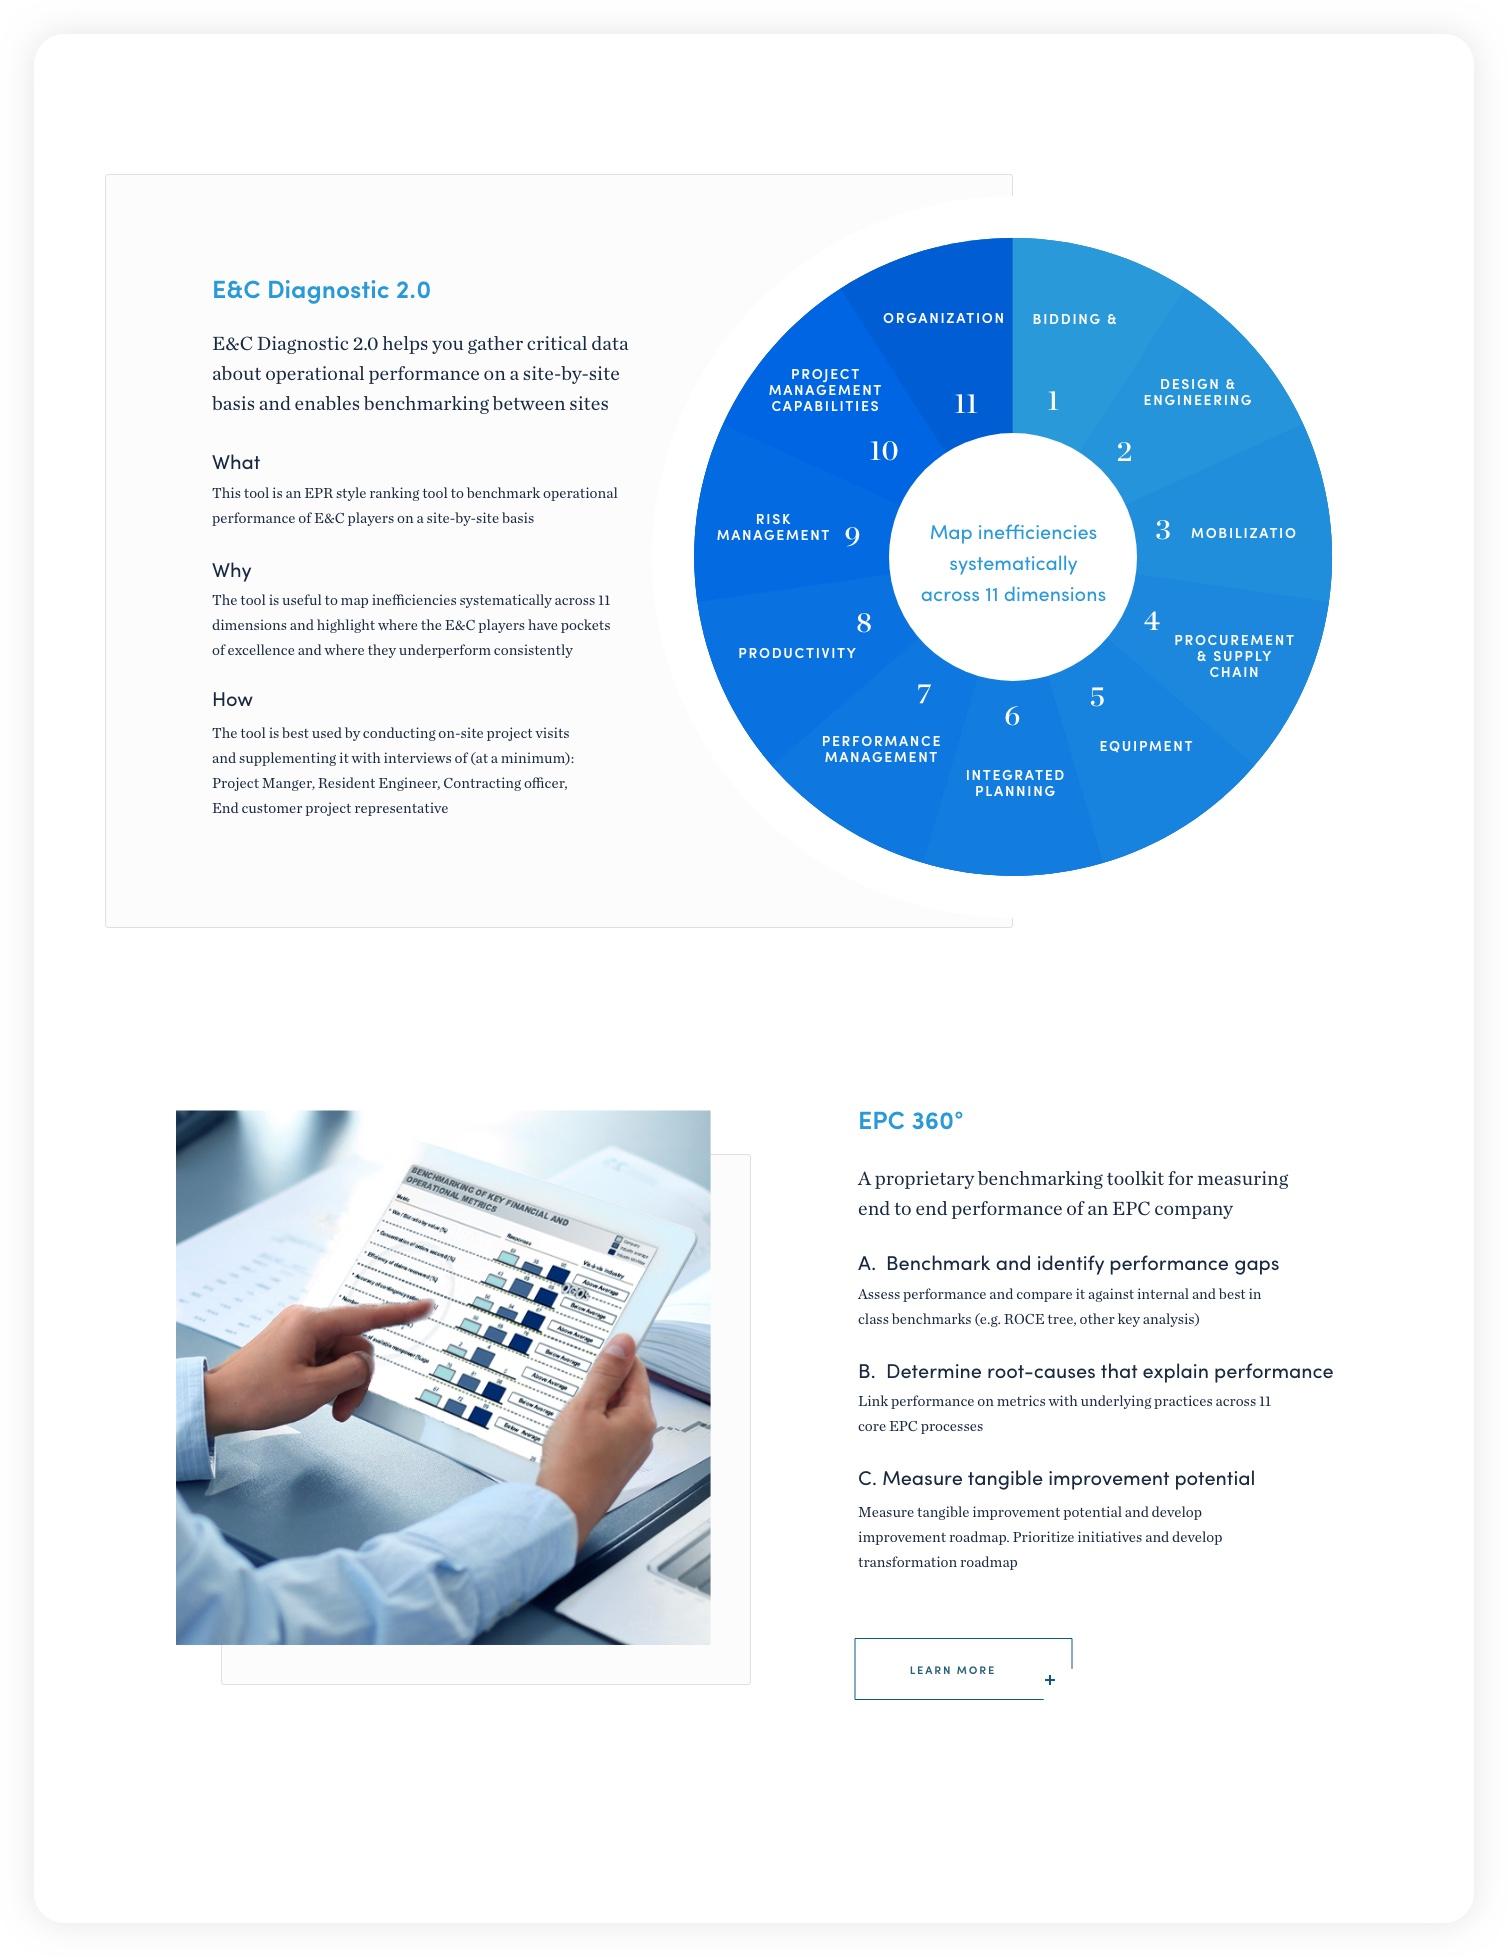 Design for E&C diagnostics pie chart – McKinsey C&E experience website: Navigating complexity